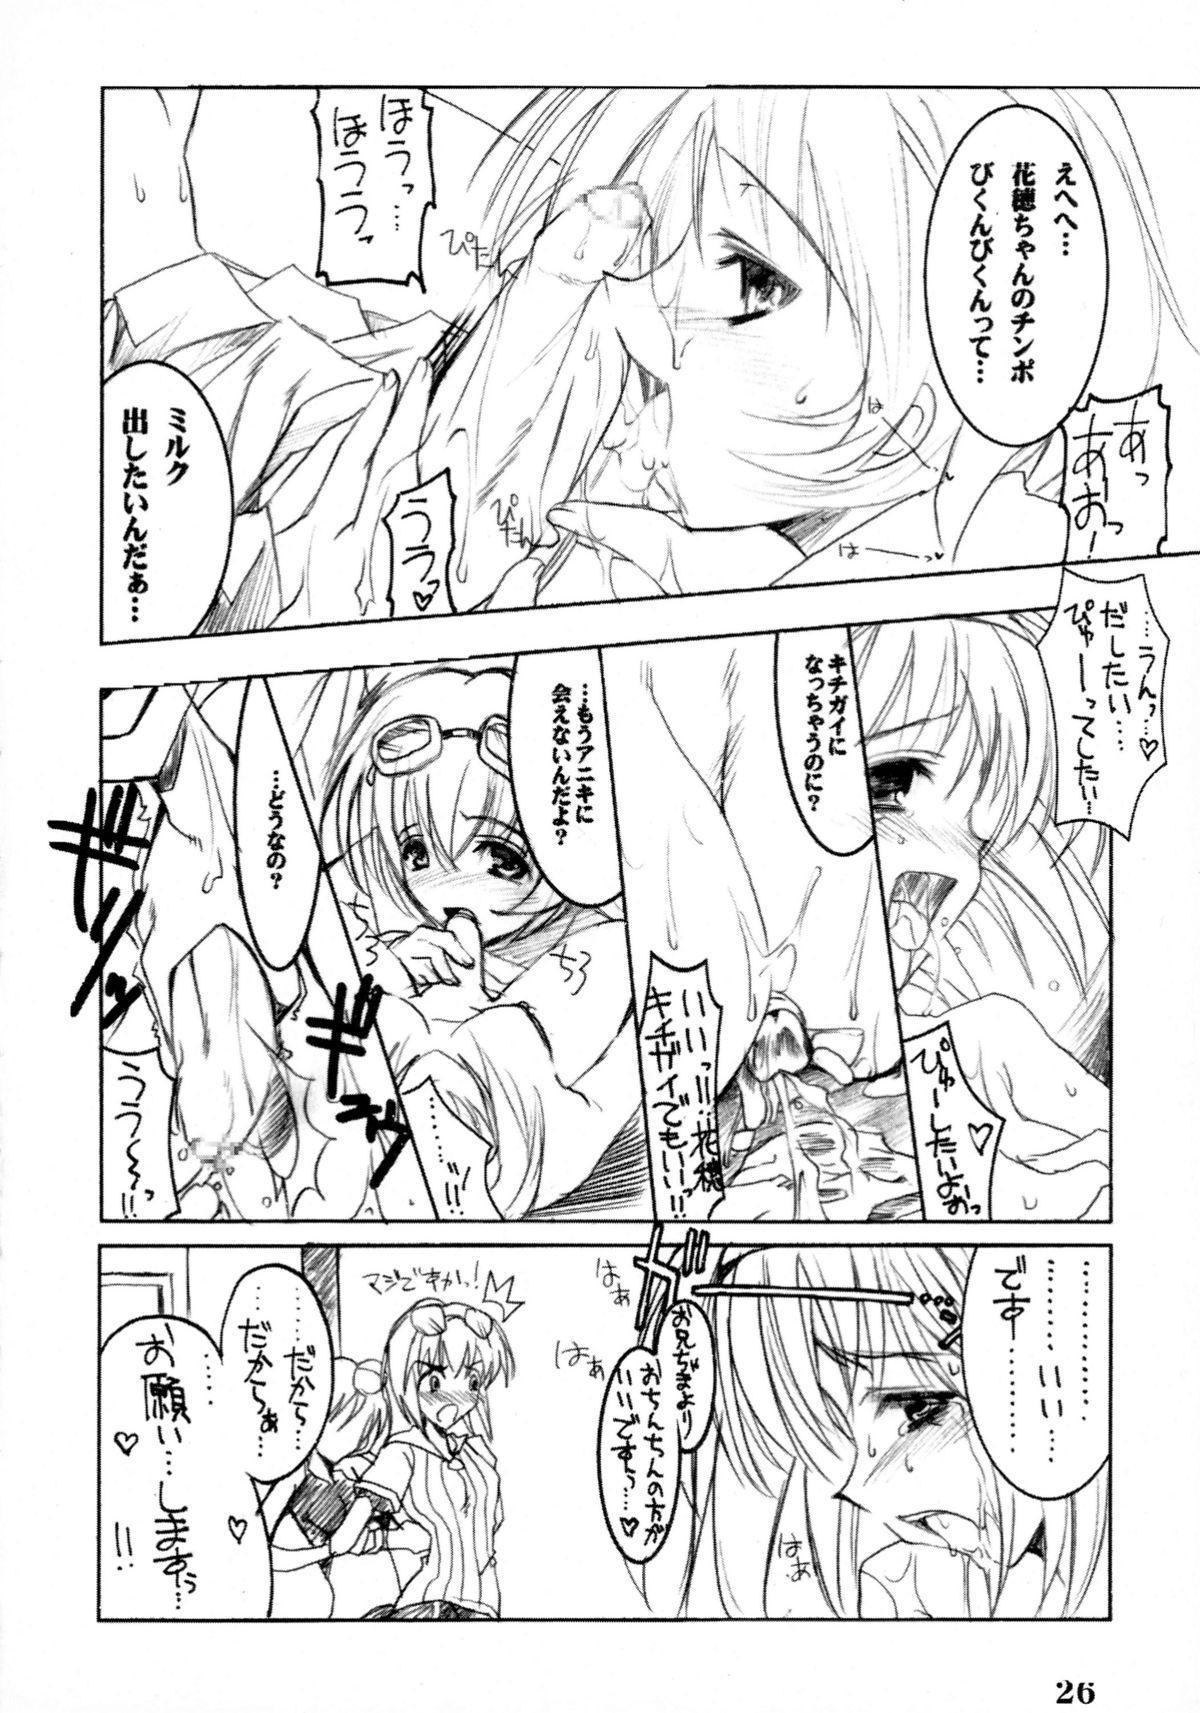 Binzume Sisters 2 24